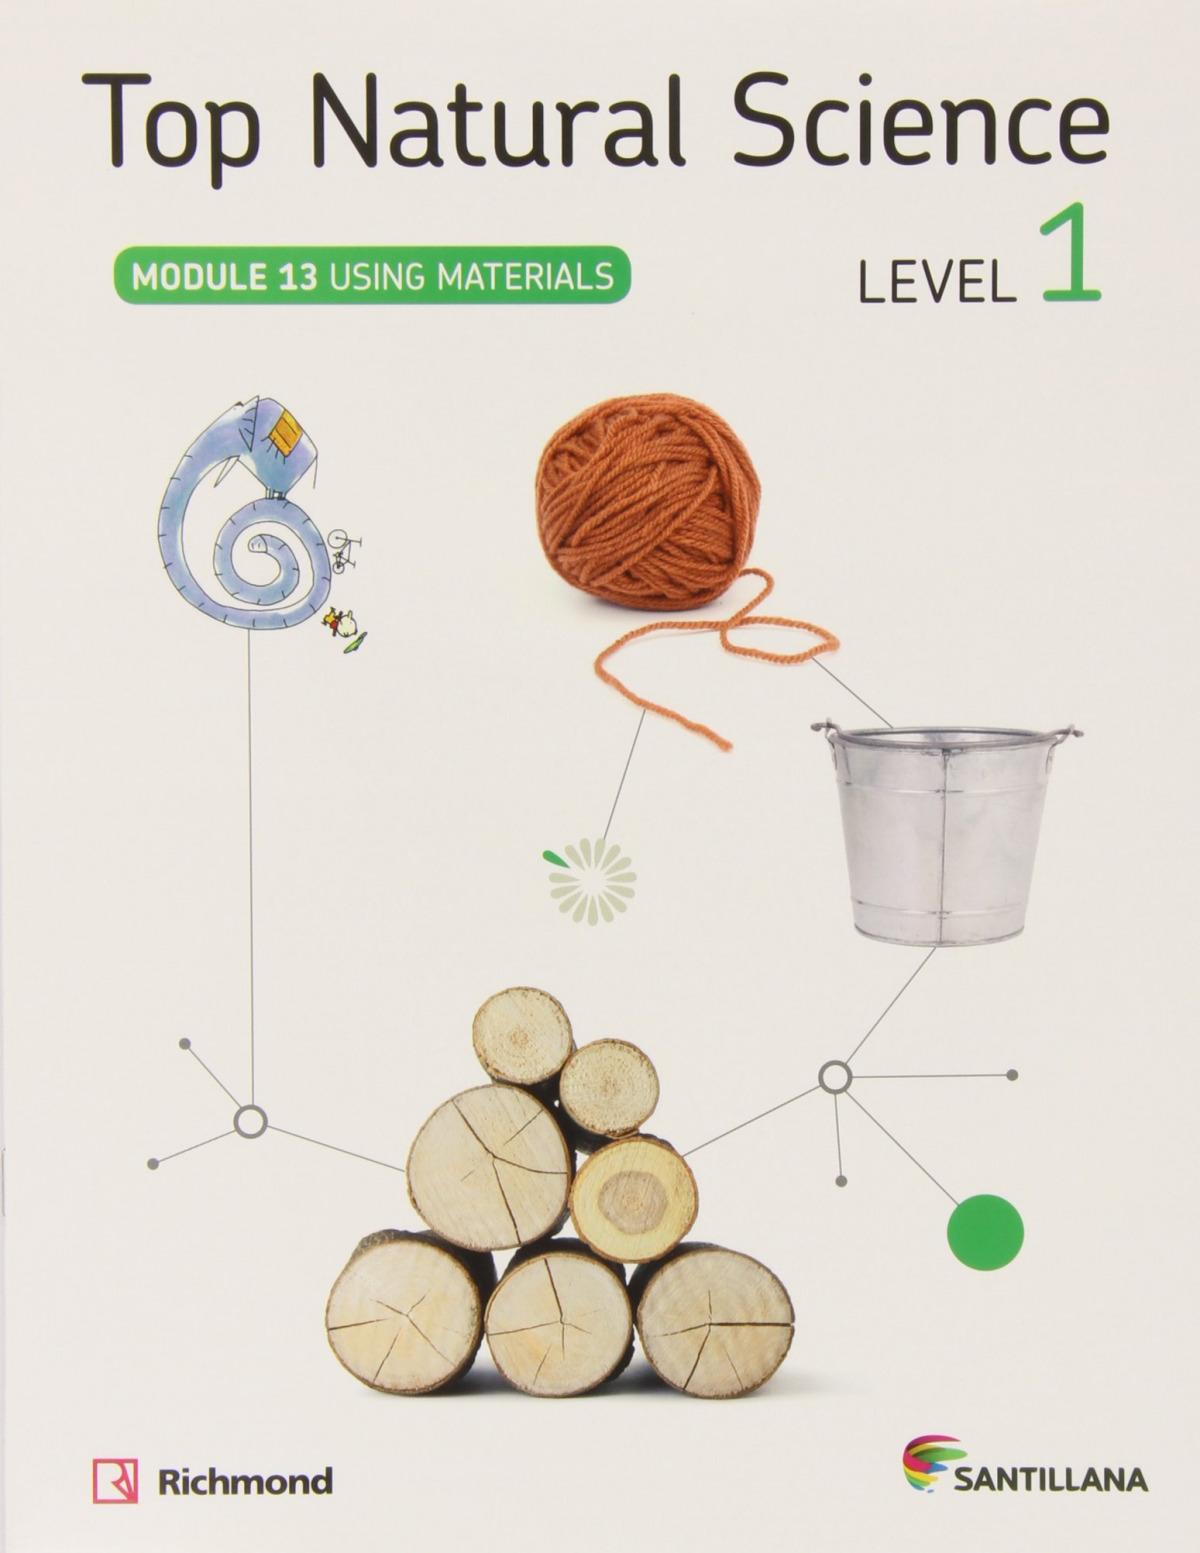 Top Natural Science 1. Using materials